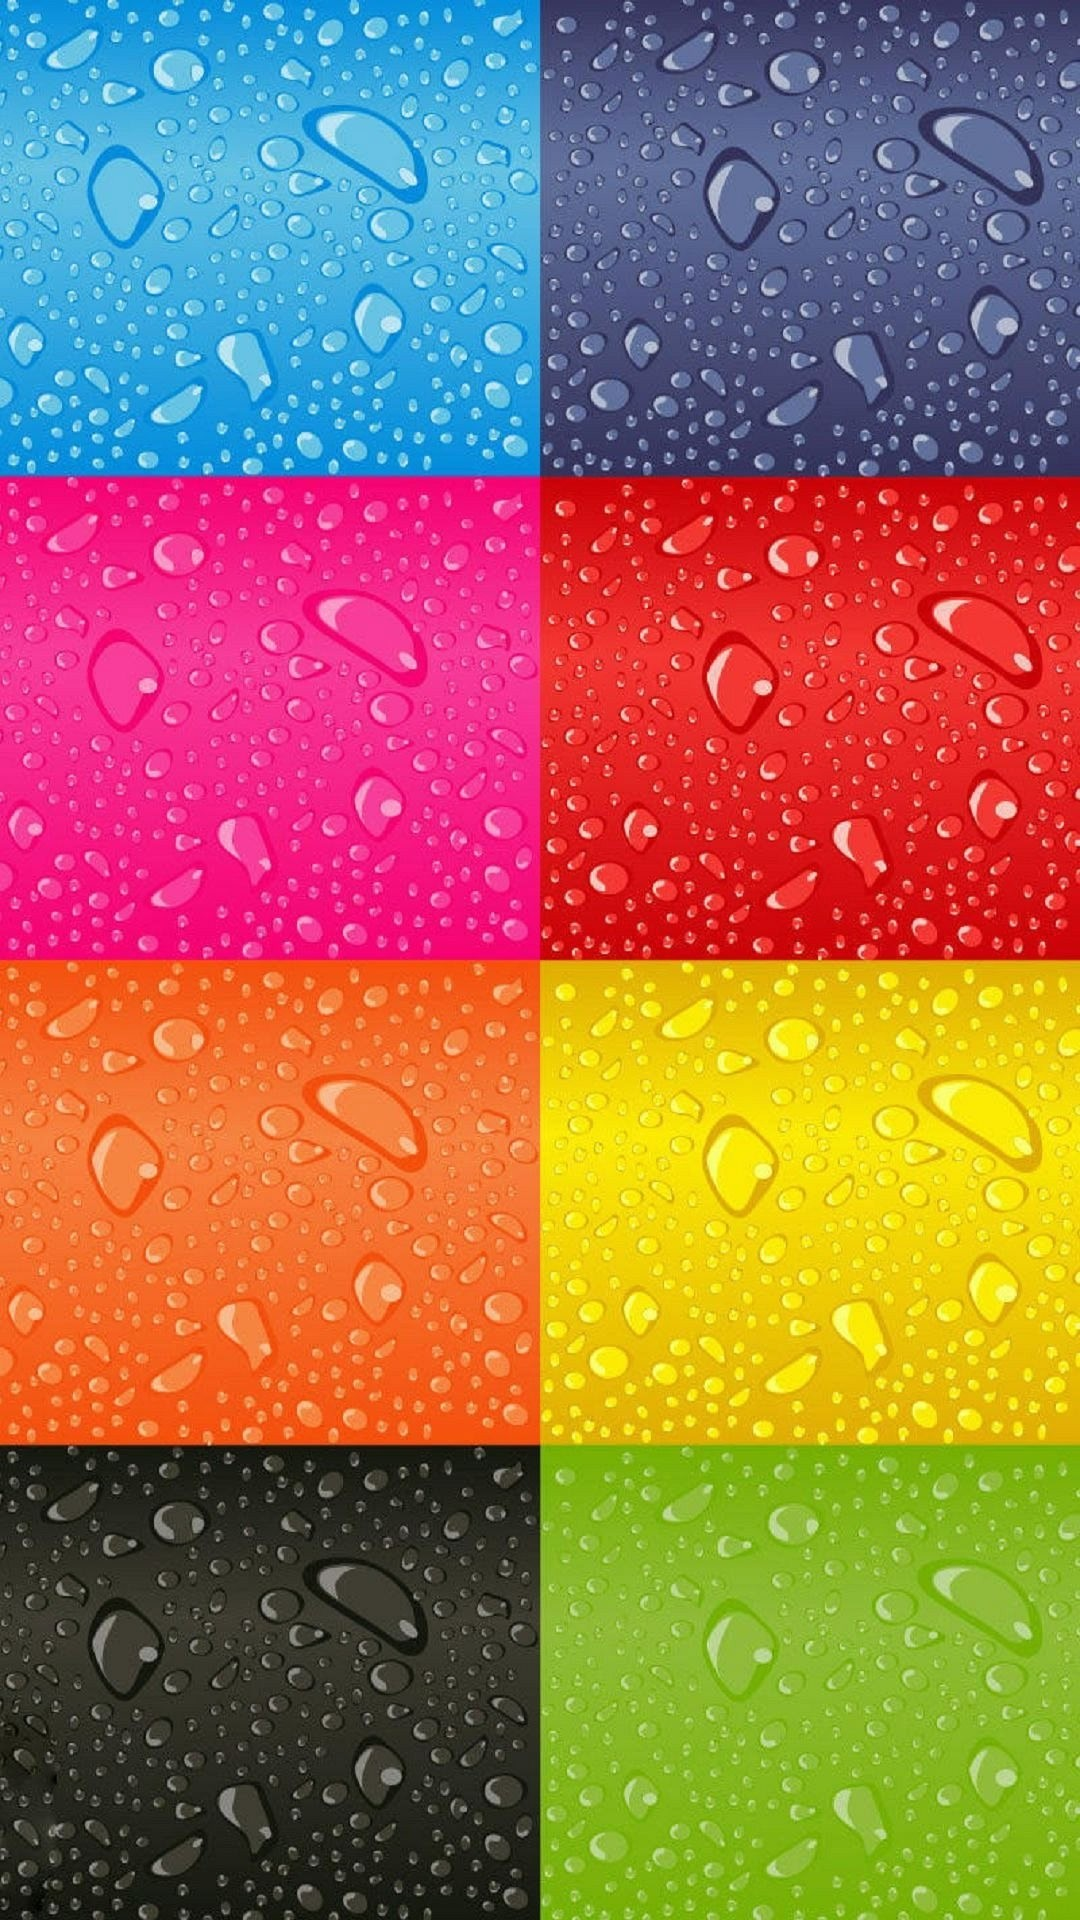 coolest iphone 6 plus wallpaper – Google Search